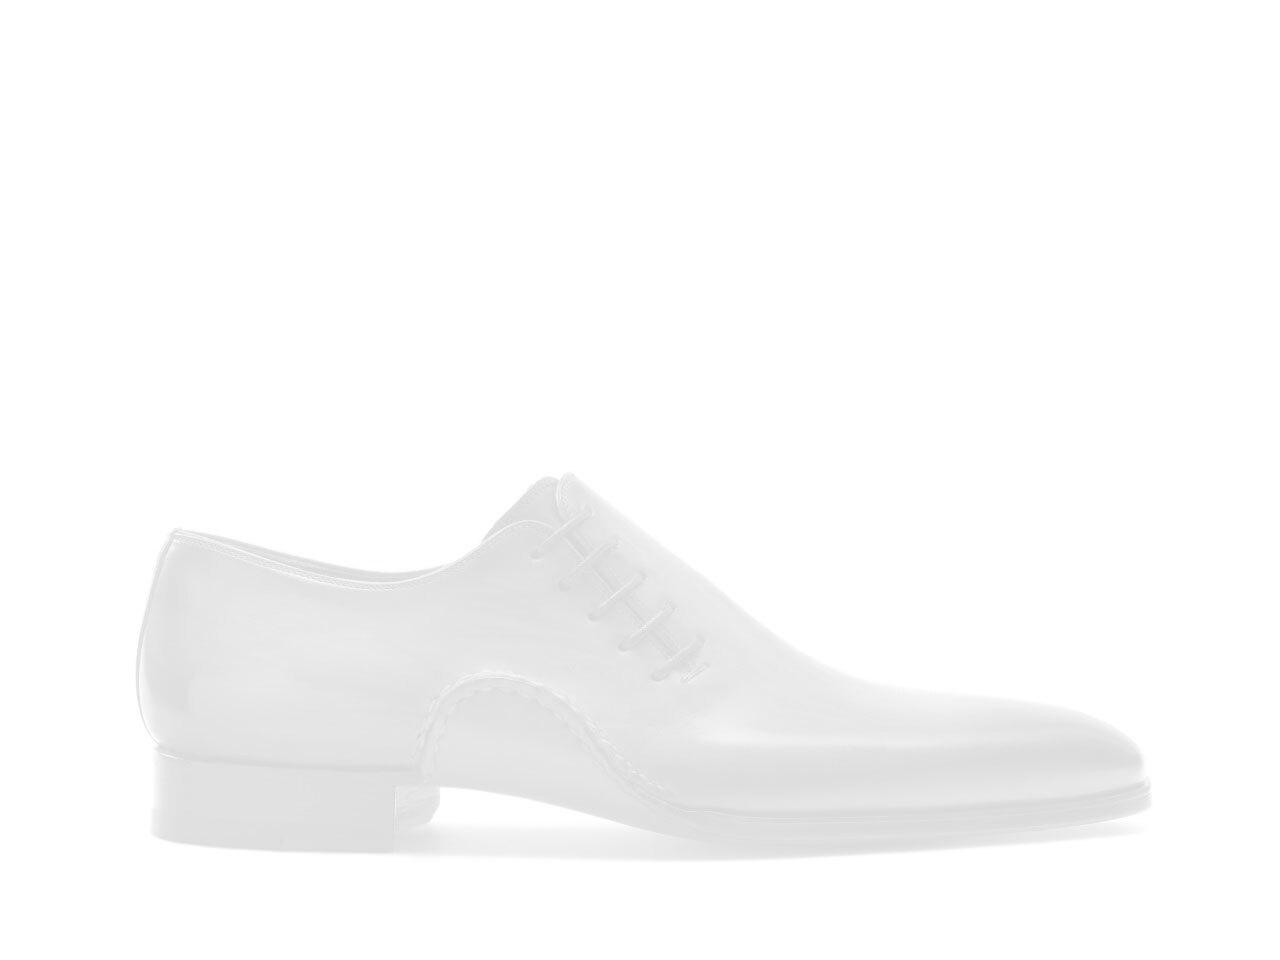 Pair of the Magnanni Brava Tinto Men's Sneakers